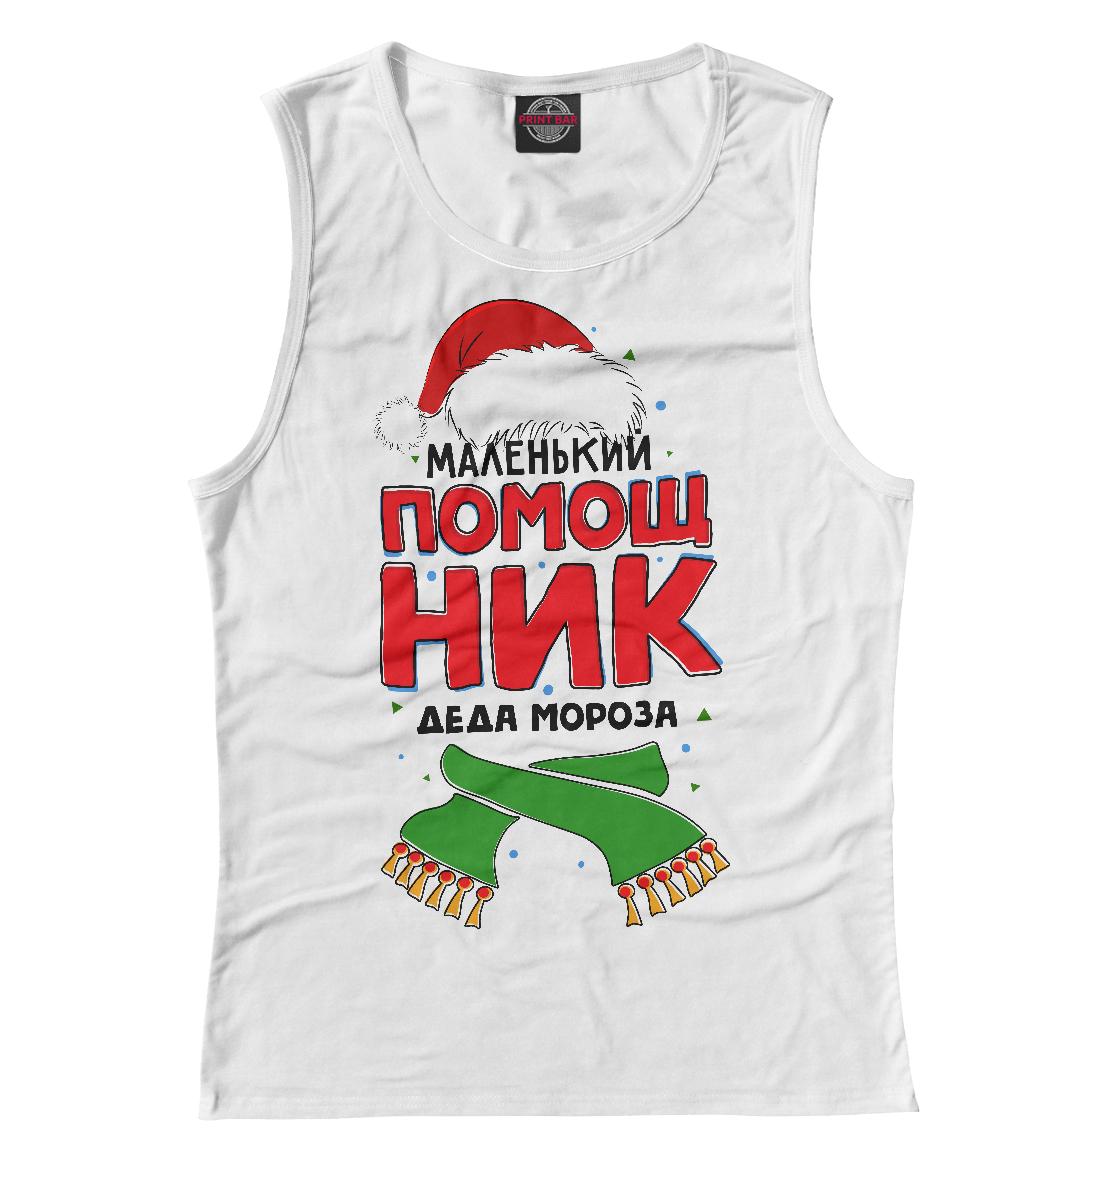 Помощник Деда Мороза